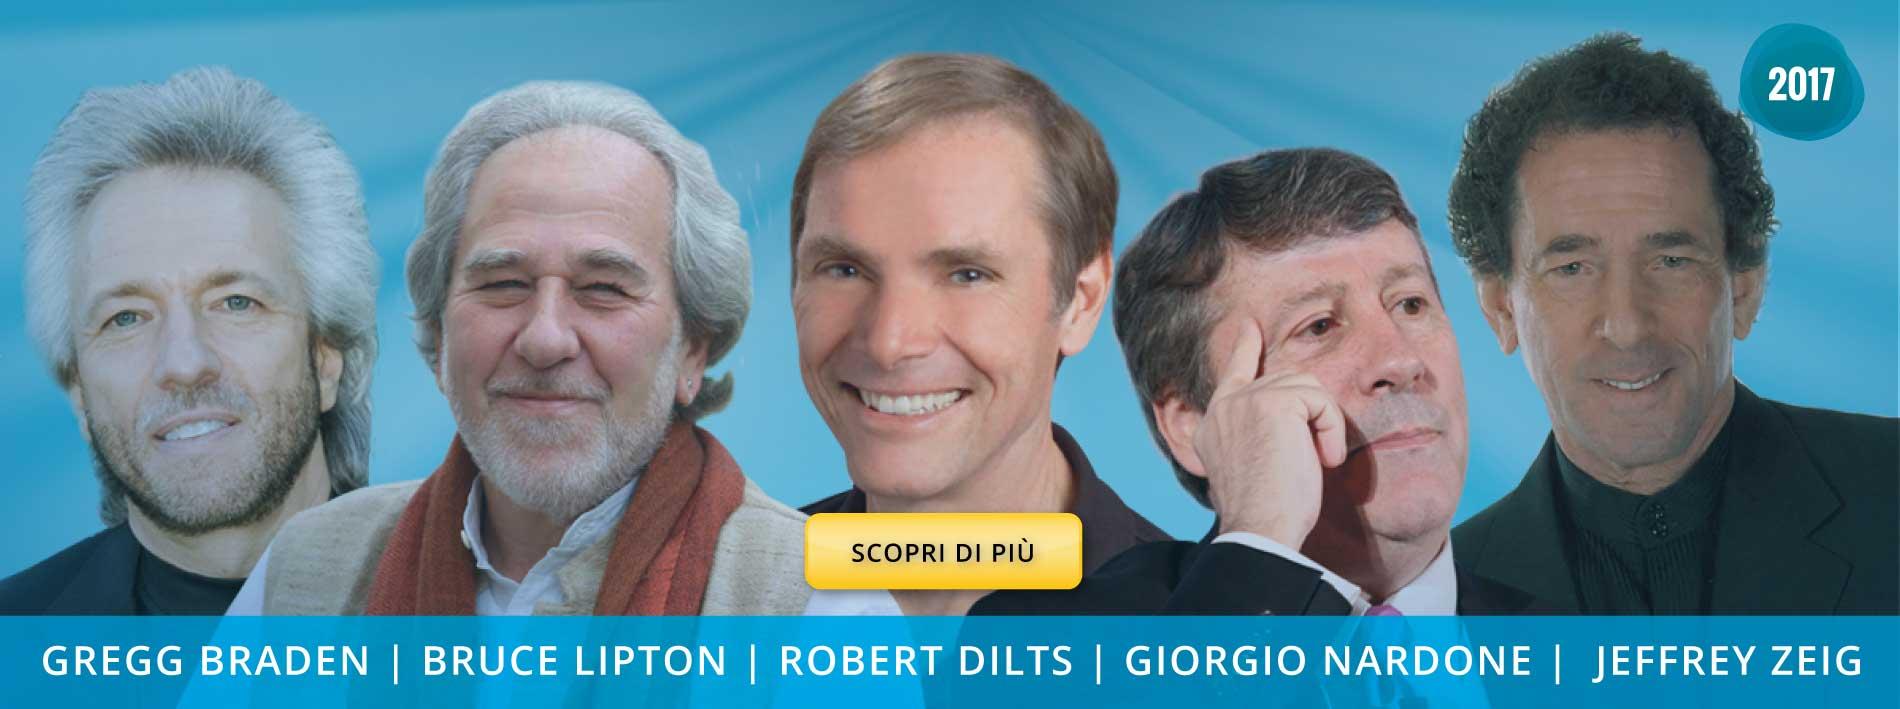 Life Strategies | Gregg Braden Bruce Lipton Robert Dilts Giorgio Nardone Jeffrey Zeig